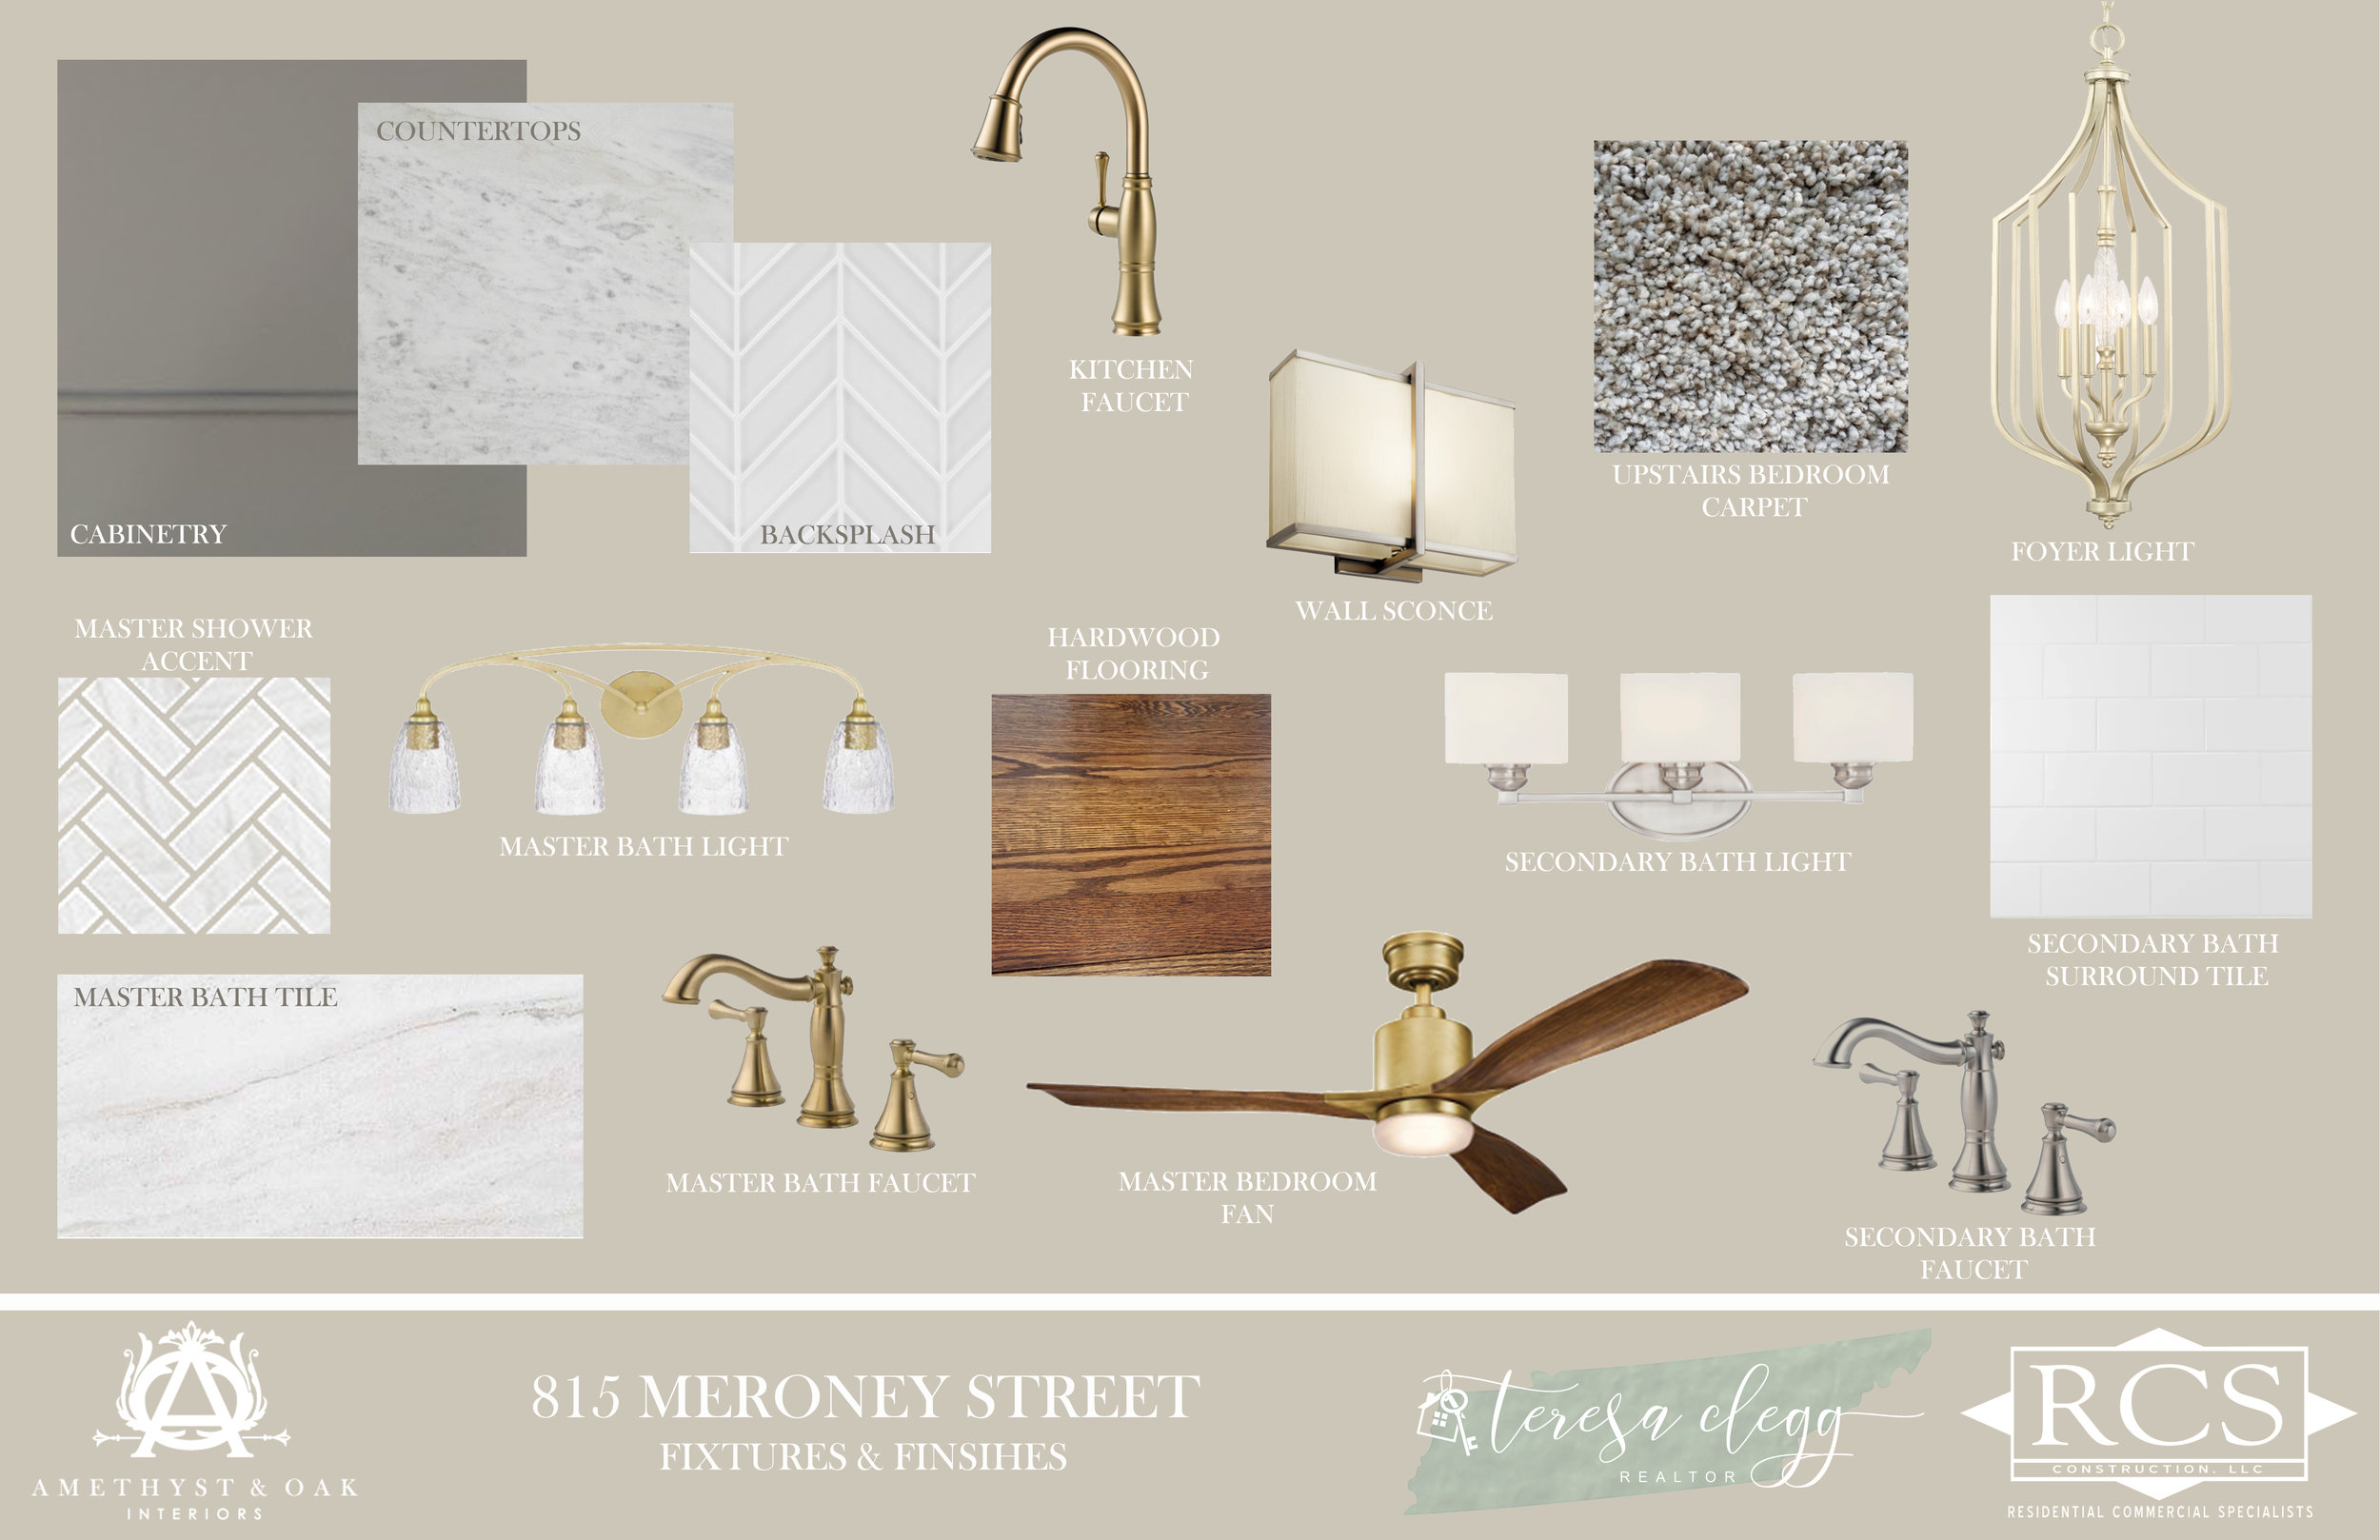 Teresa Clegg Chattanooga Realtor Design Board 815 Meroney